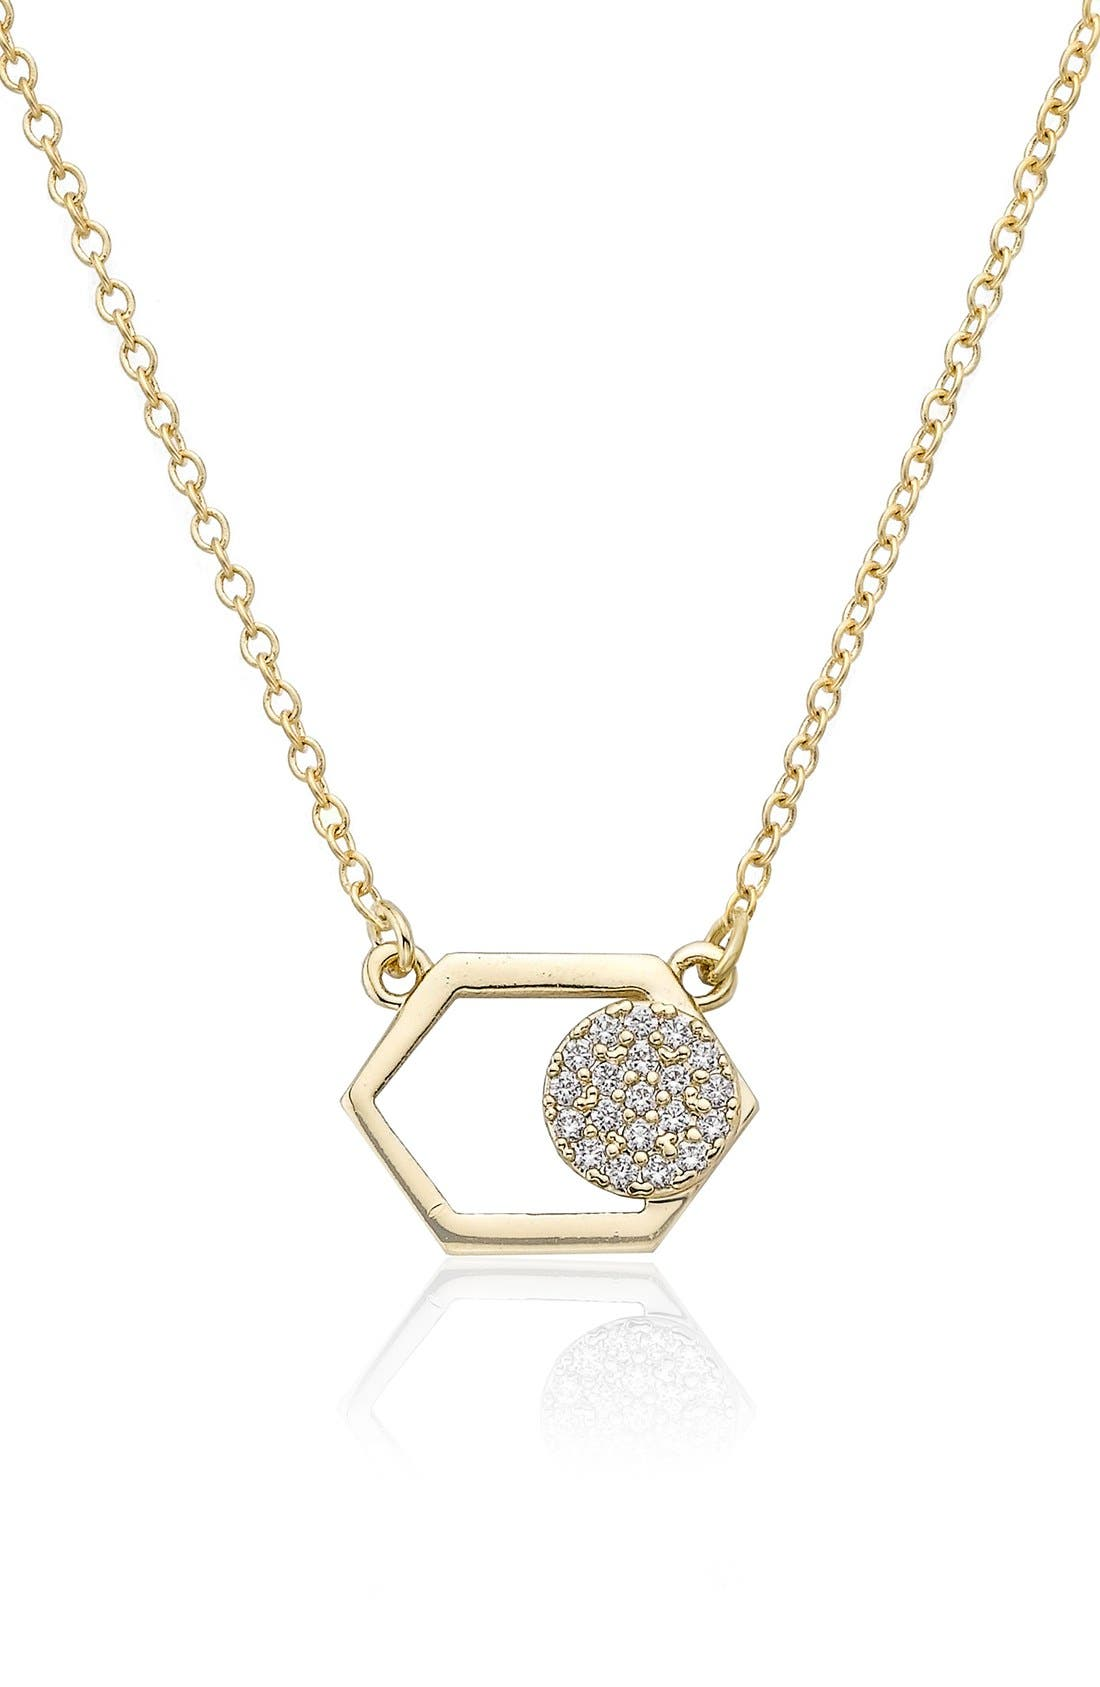 RICCOVA, Hexagon & Pavé Circle Pendant Necklace, Main thumbnail 1, color, 710